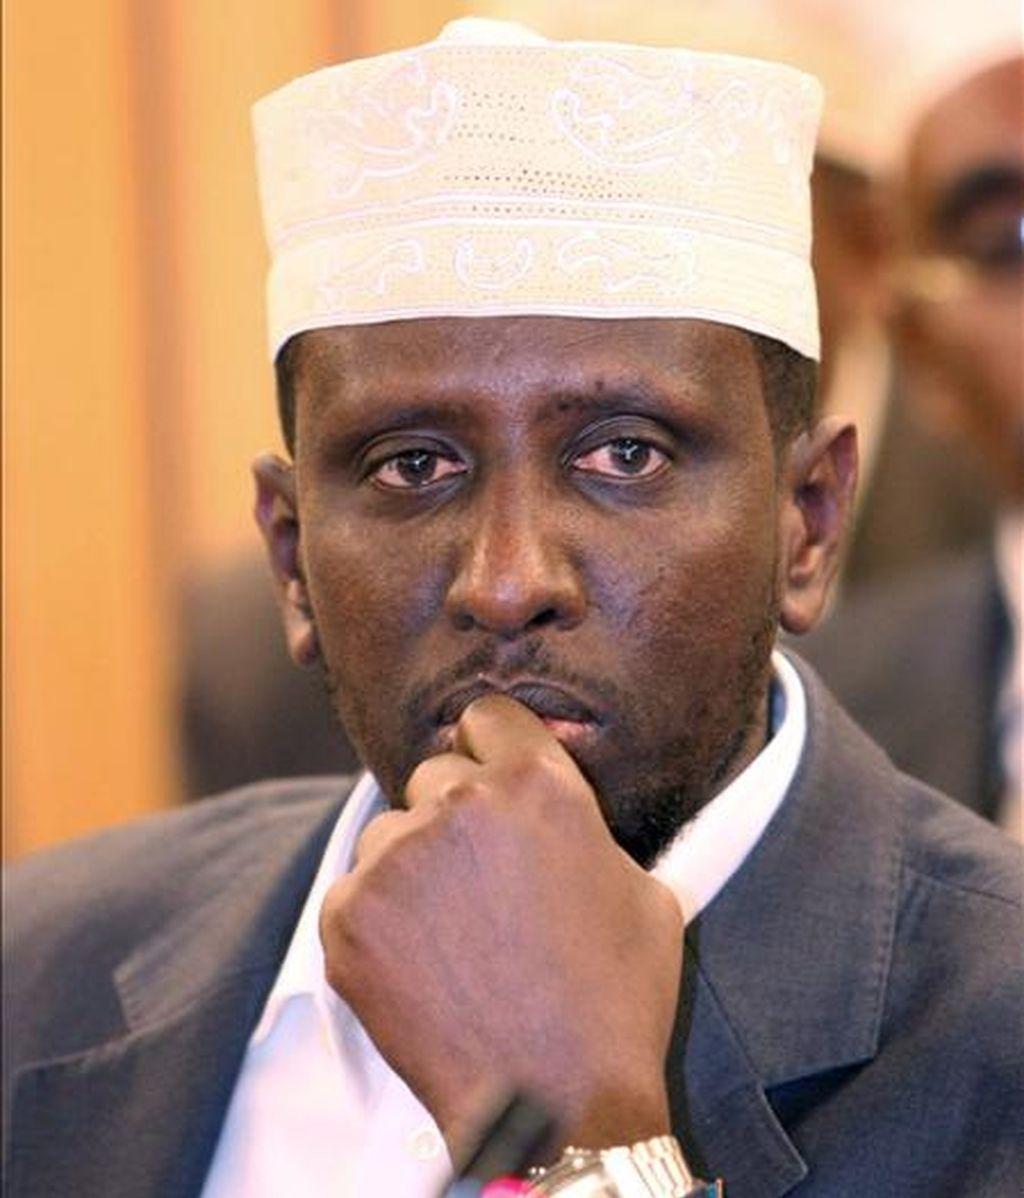 El presidente de Somalia, Sharif Sheikh Ahmed. EFE/Archivo